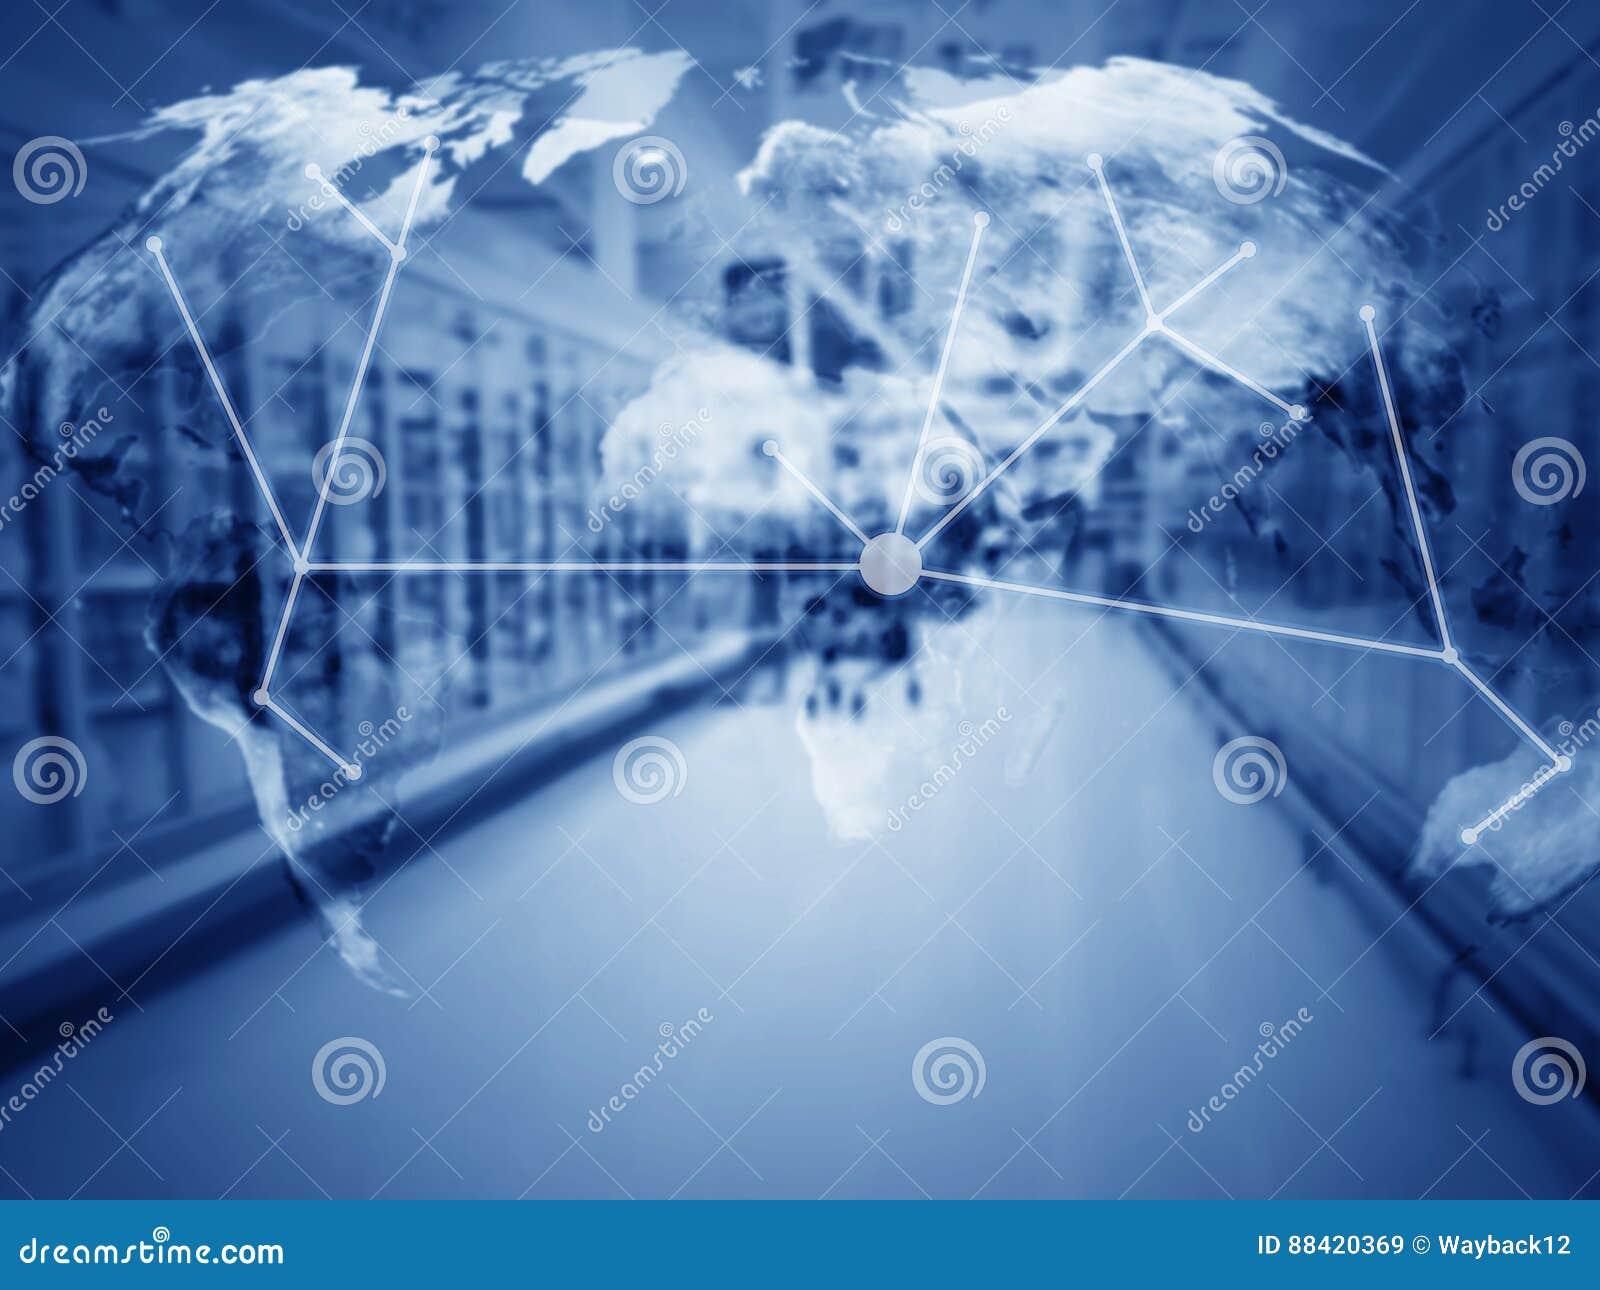 供应链管理概念,拷贝空间